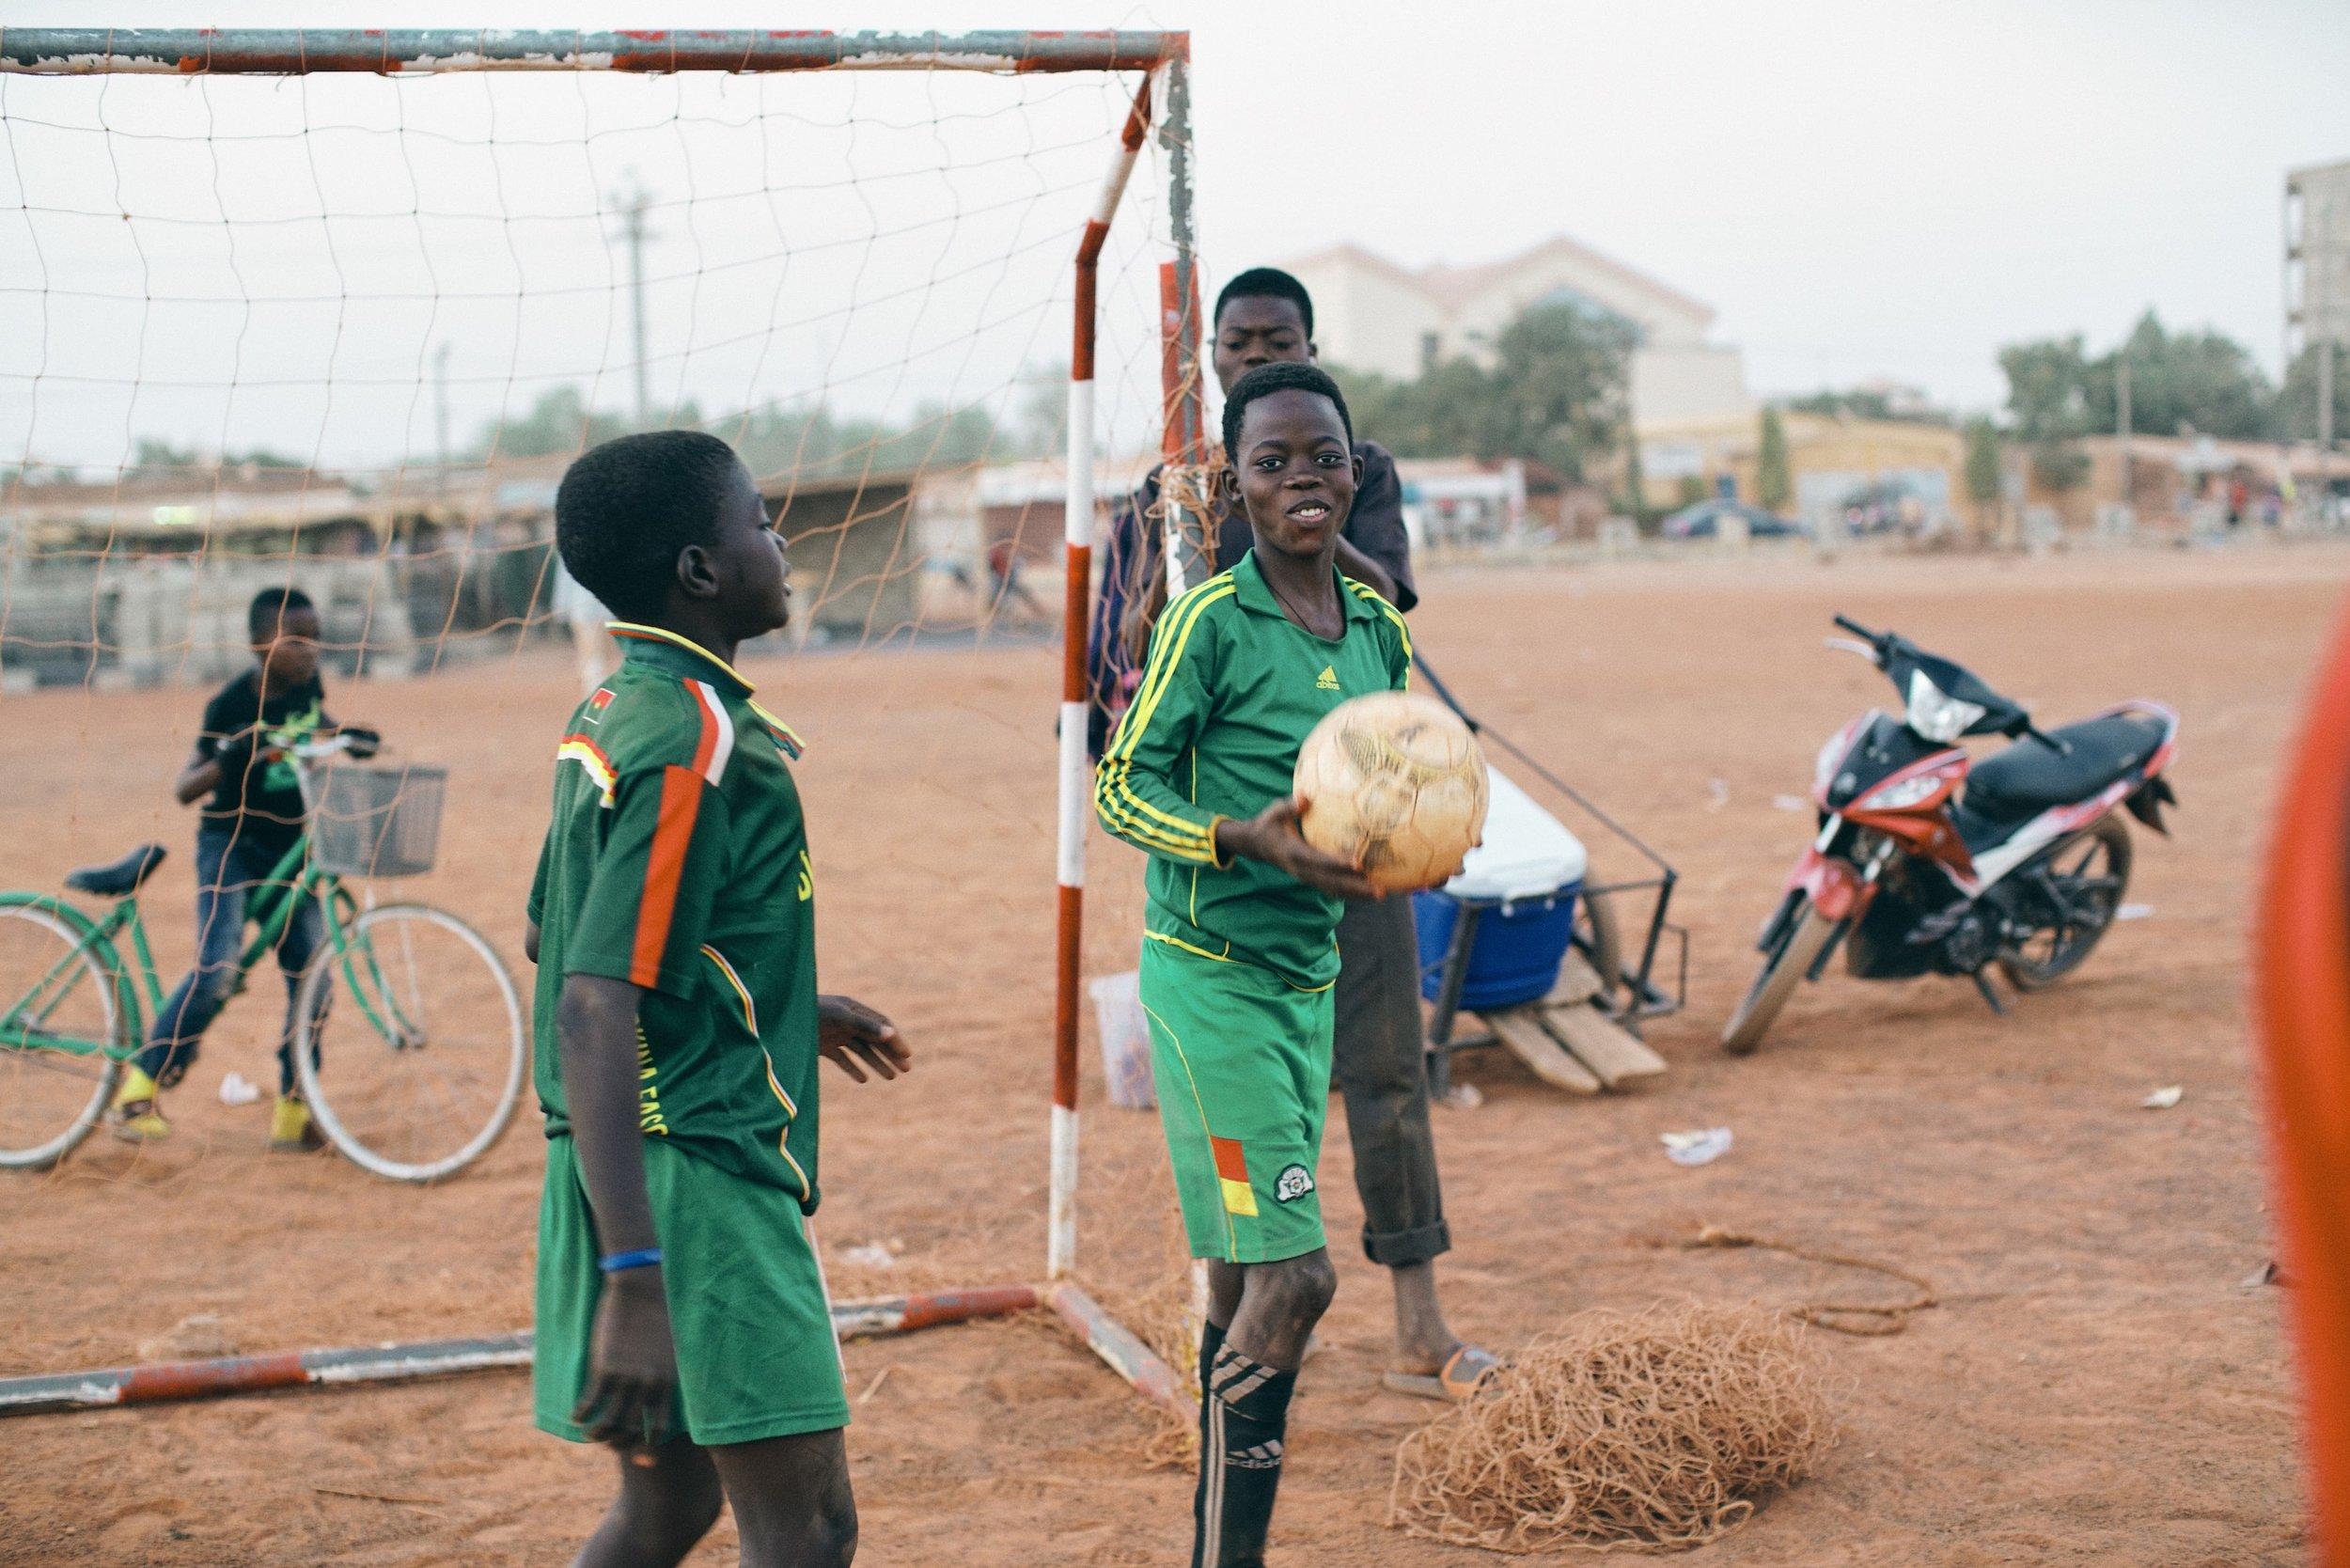 Stockdale_Ouagadougou29.jpg